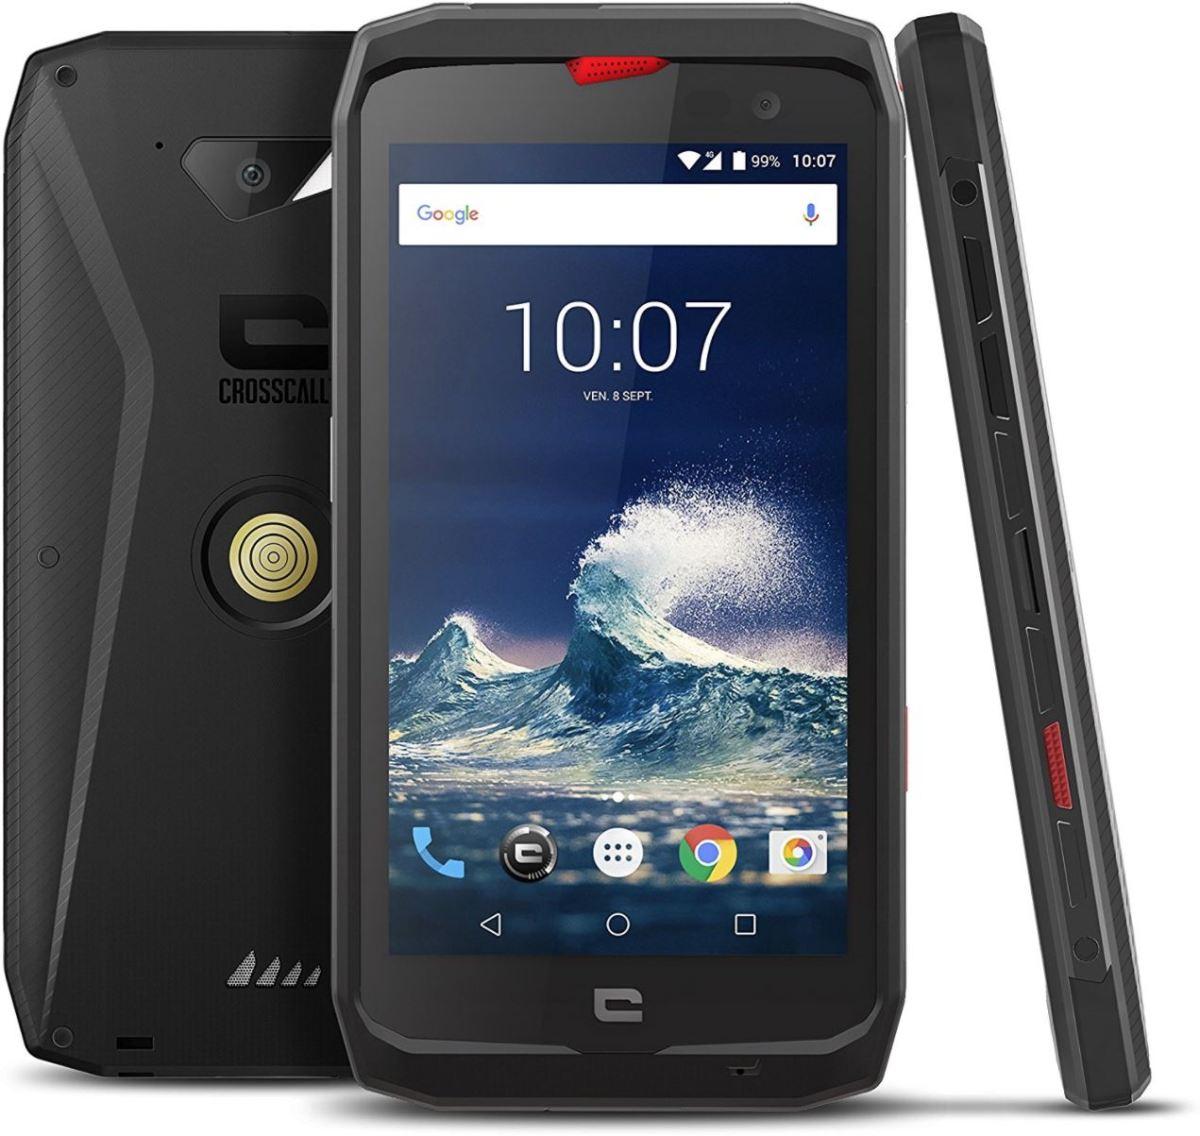 Crosscall Action-X3 Outdoor Smartphone